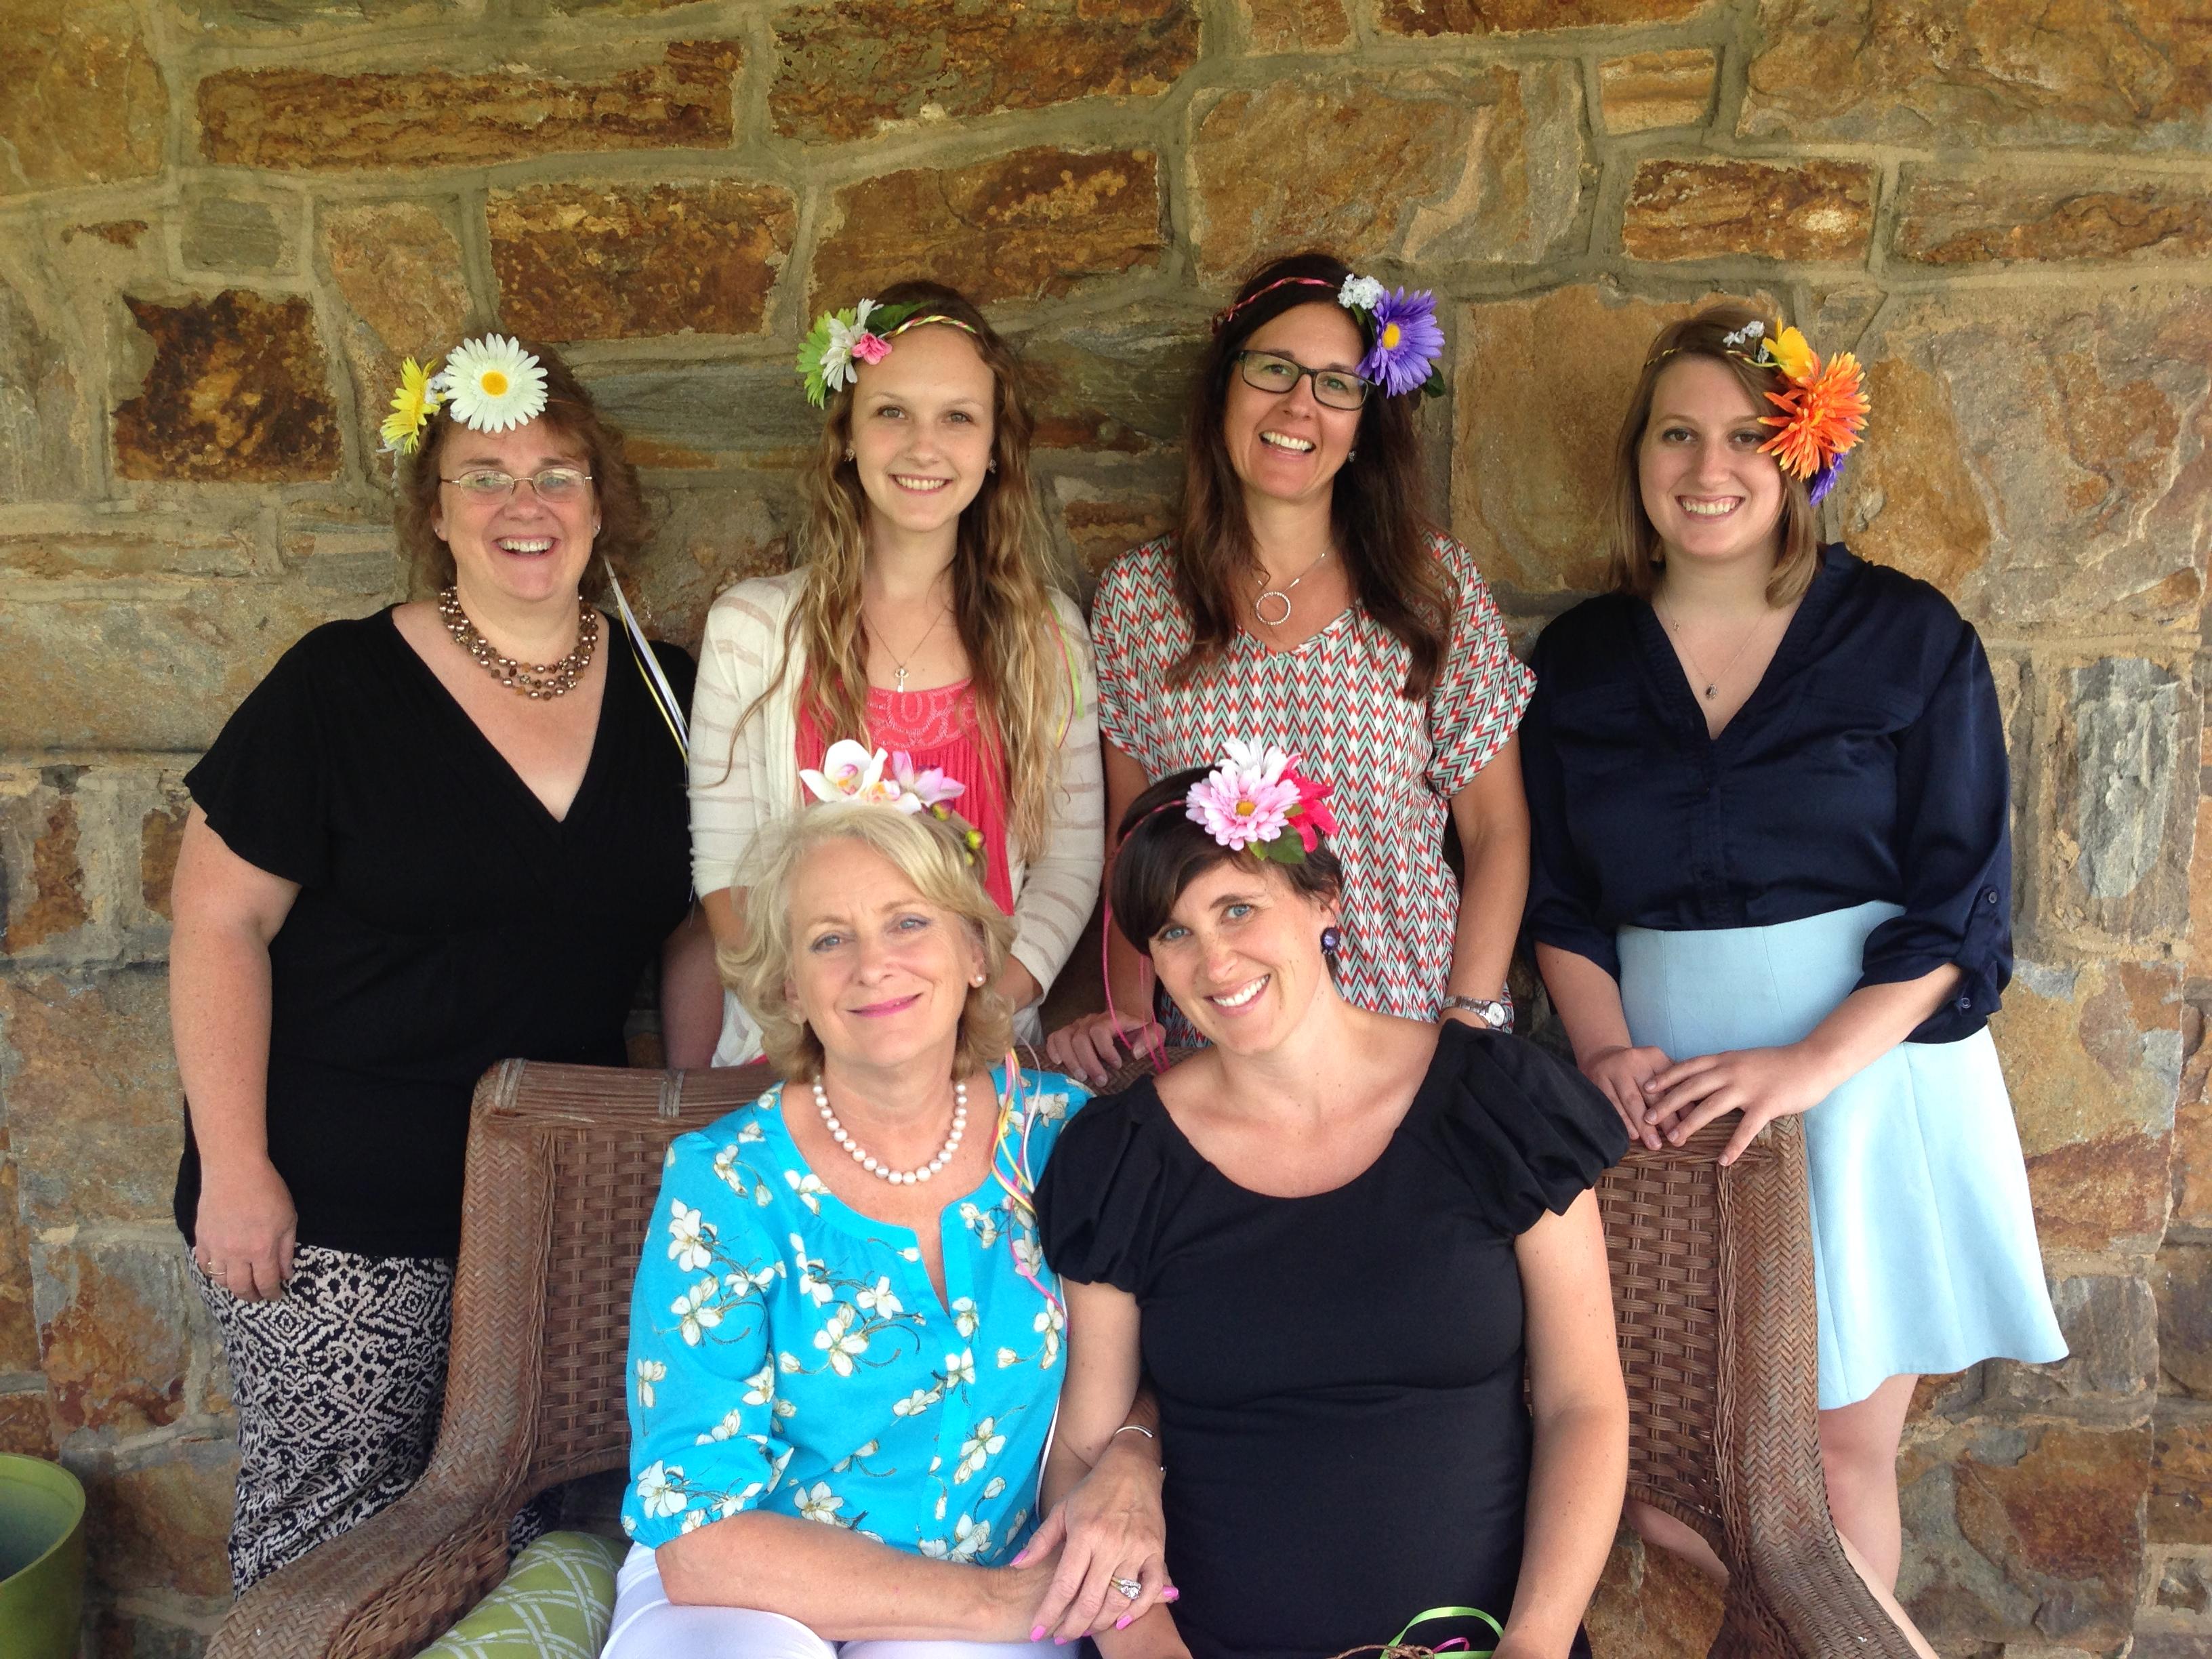 garden media group, flower crowns, fun business activities,